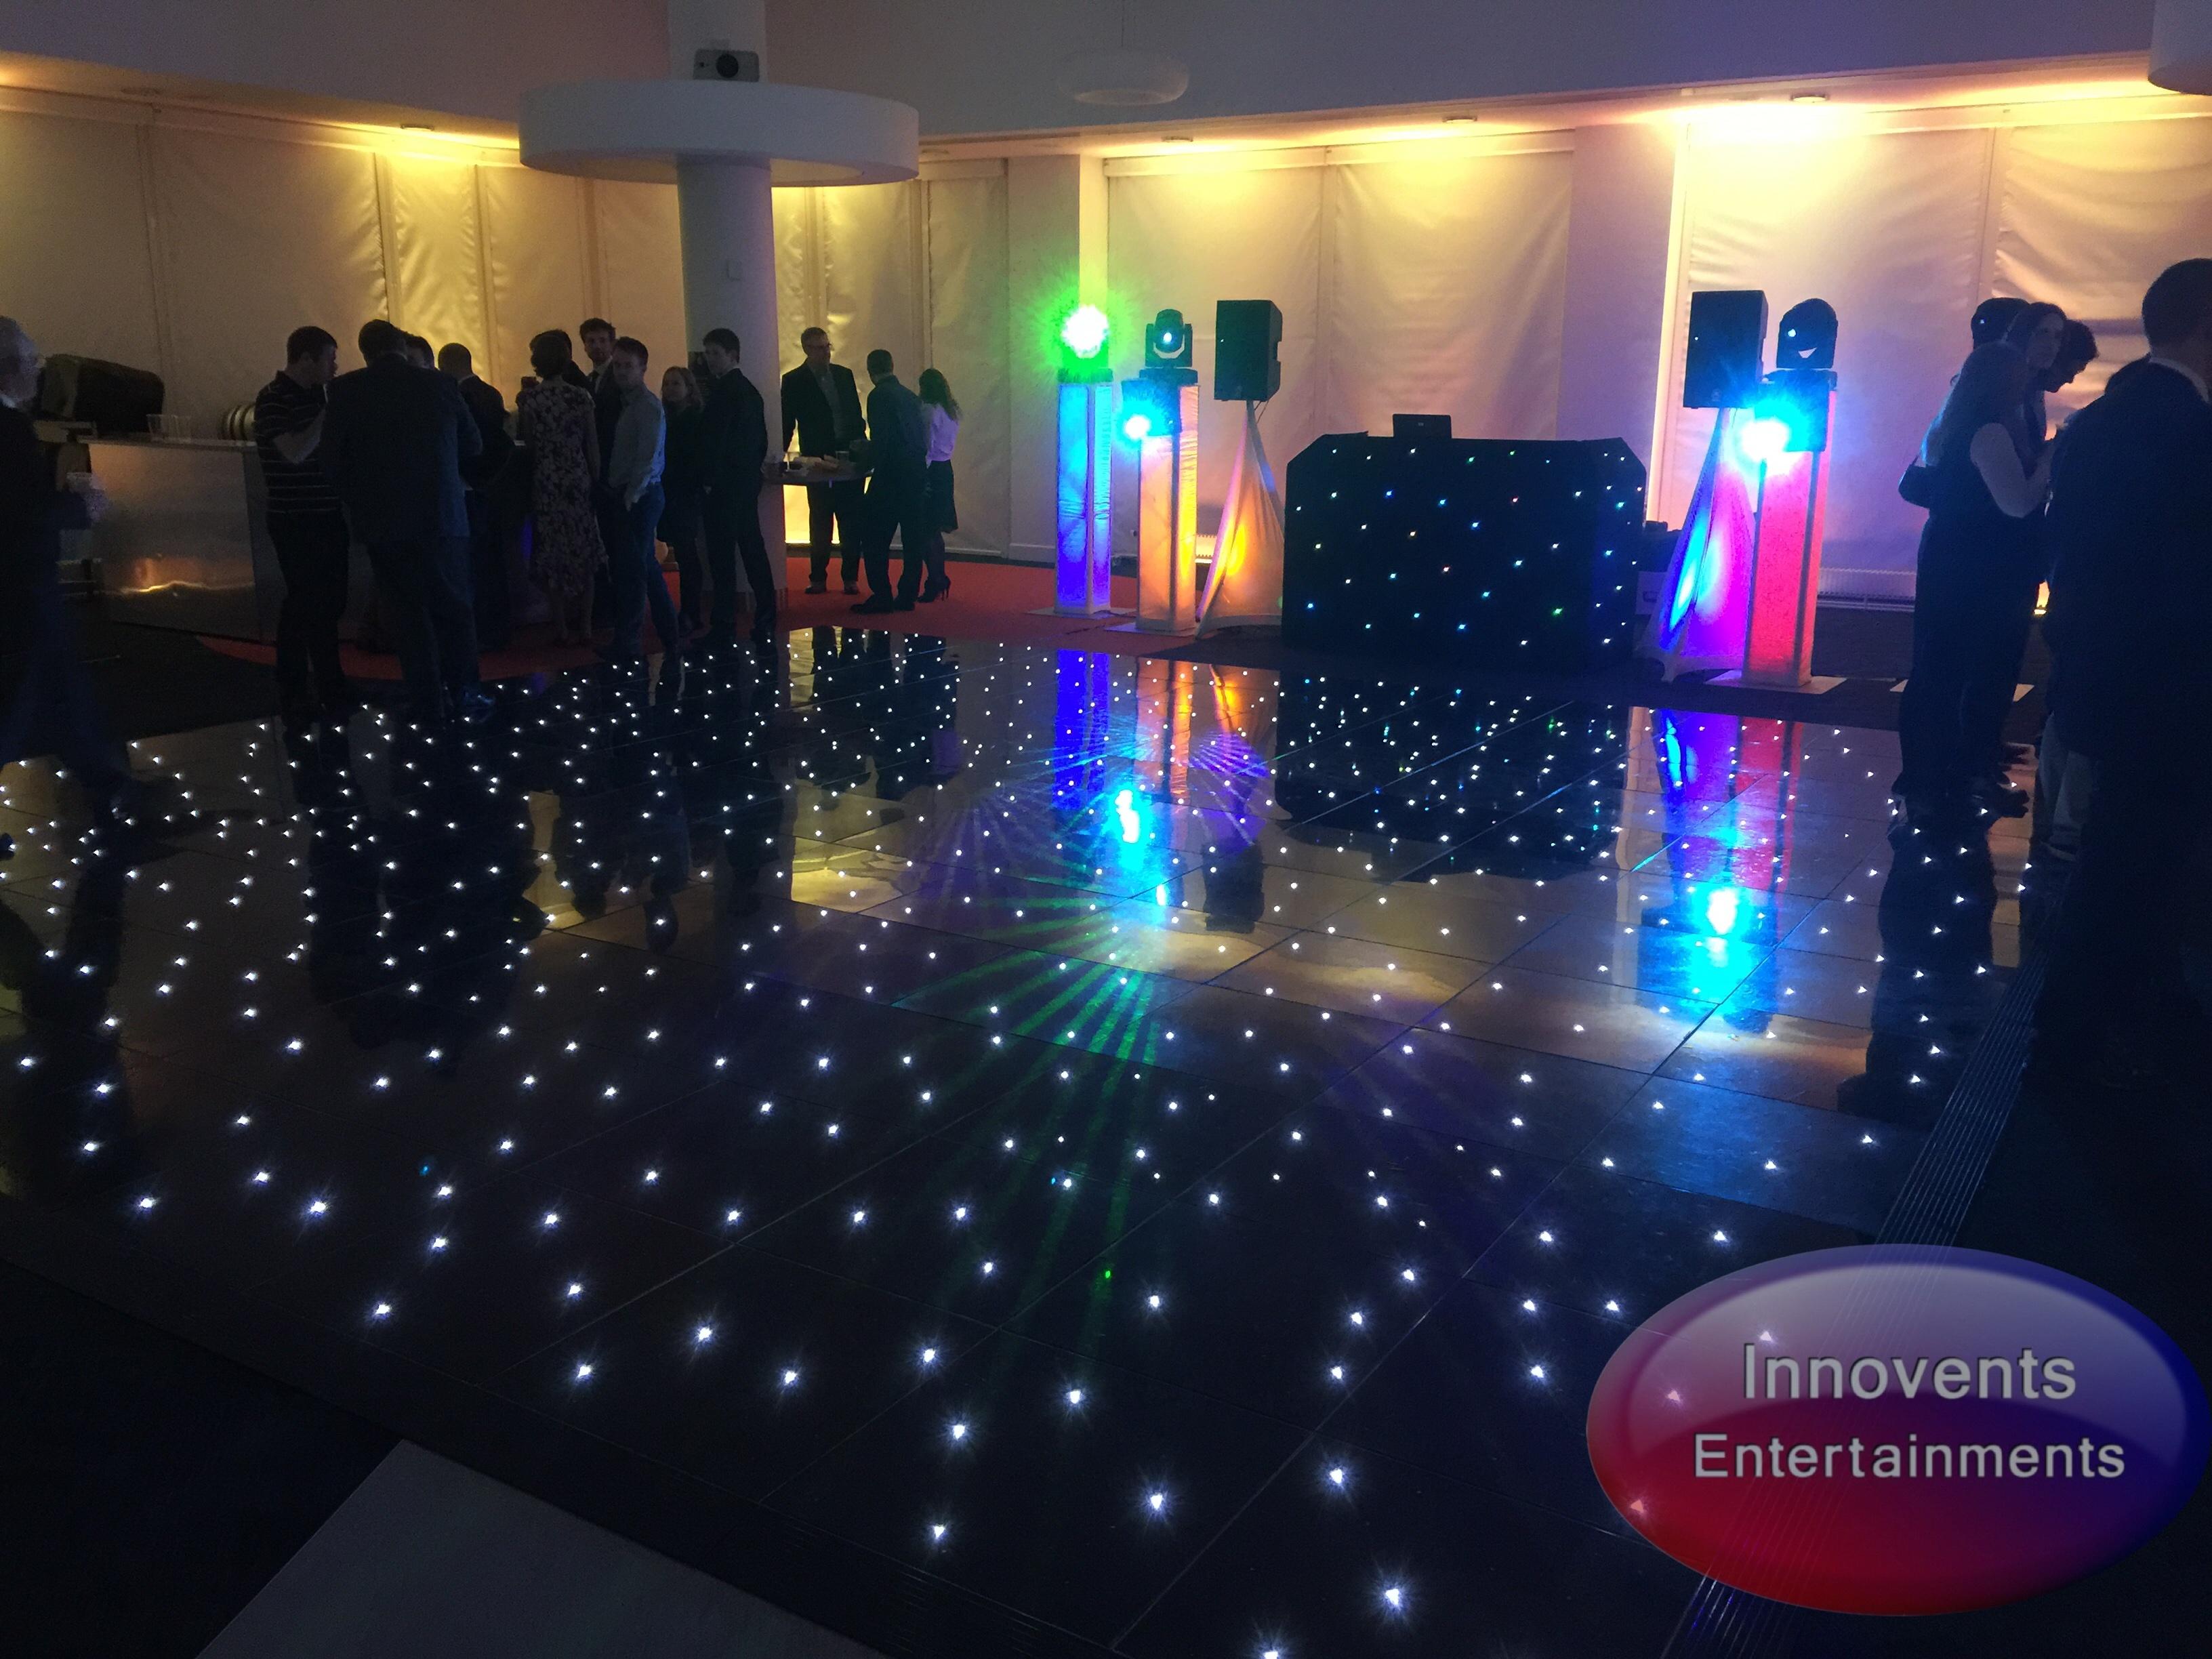 Black led dance floor - Corporate Party